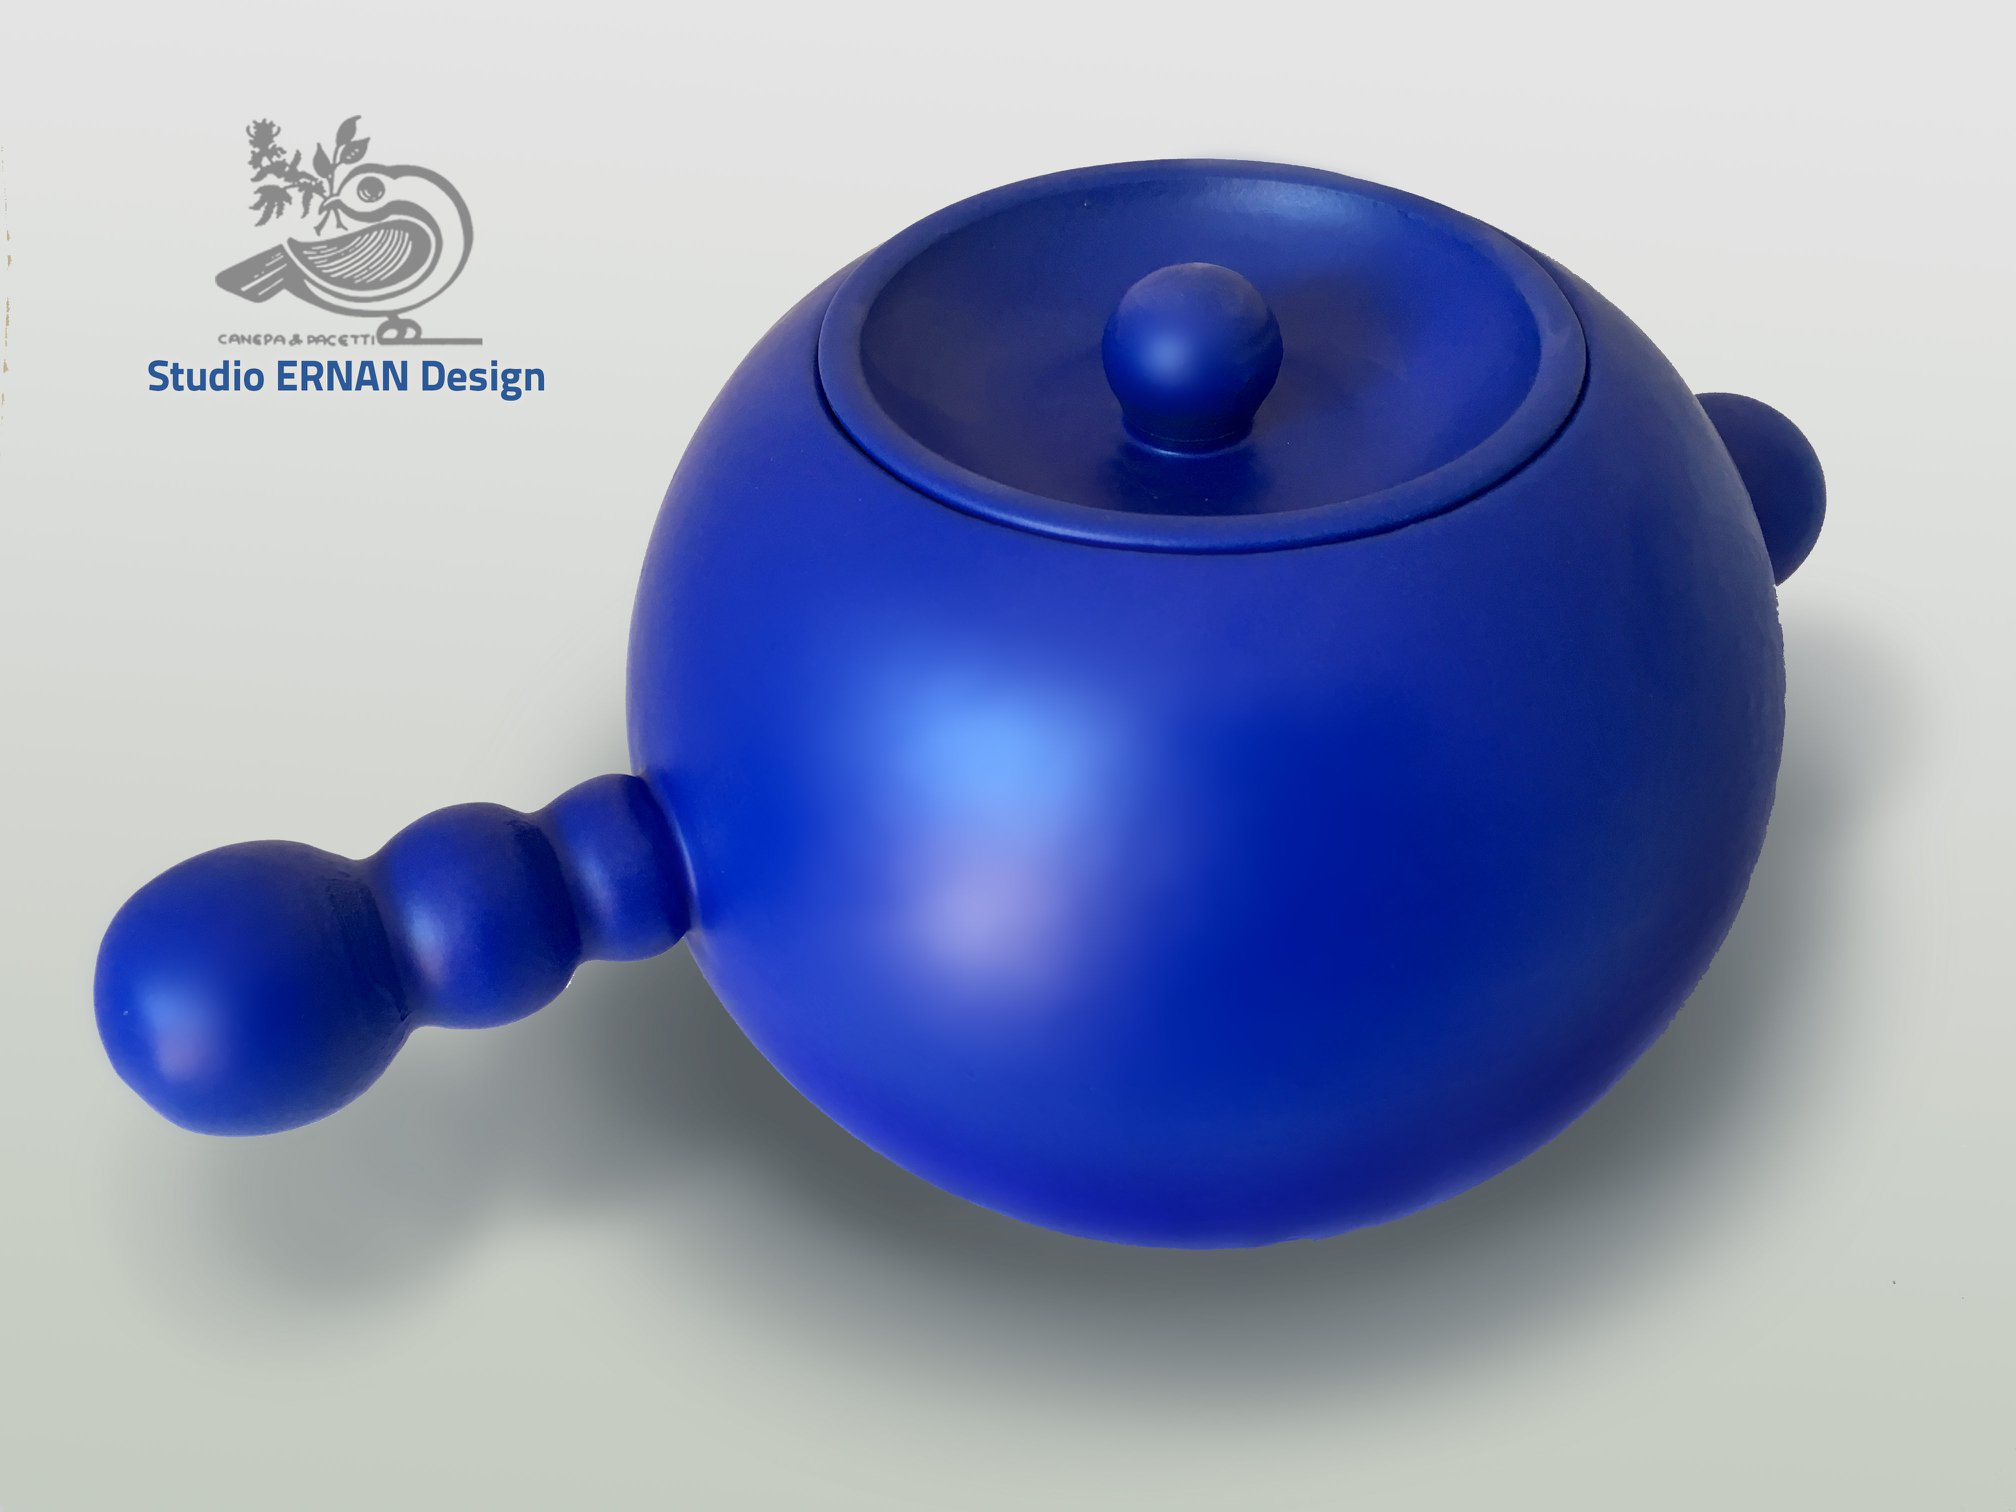 studio-ernan-design-ceramisti-albisola-superiore-savona-thumbnail